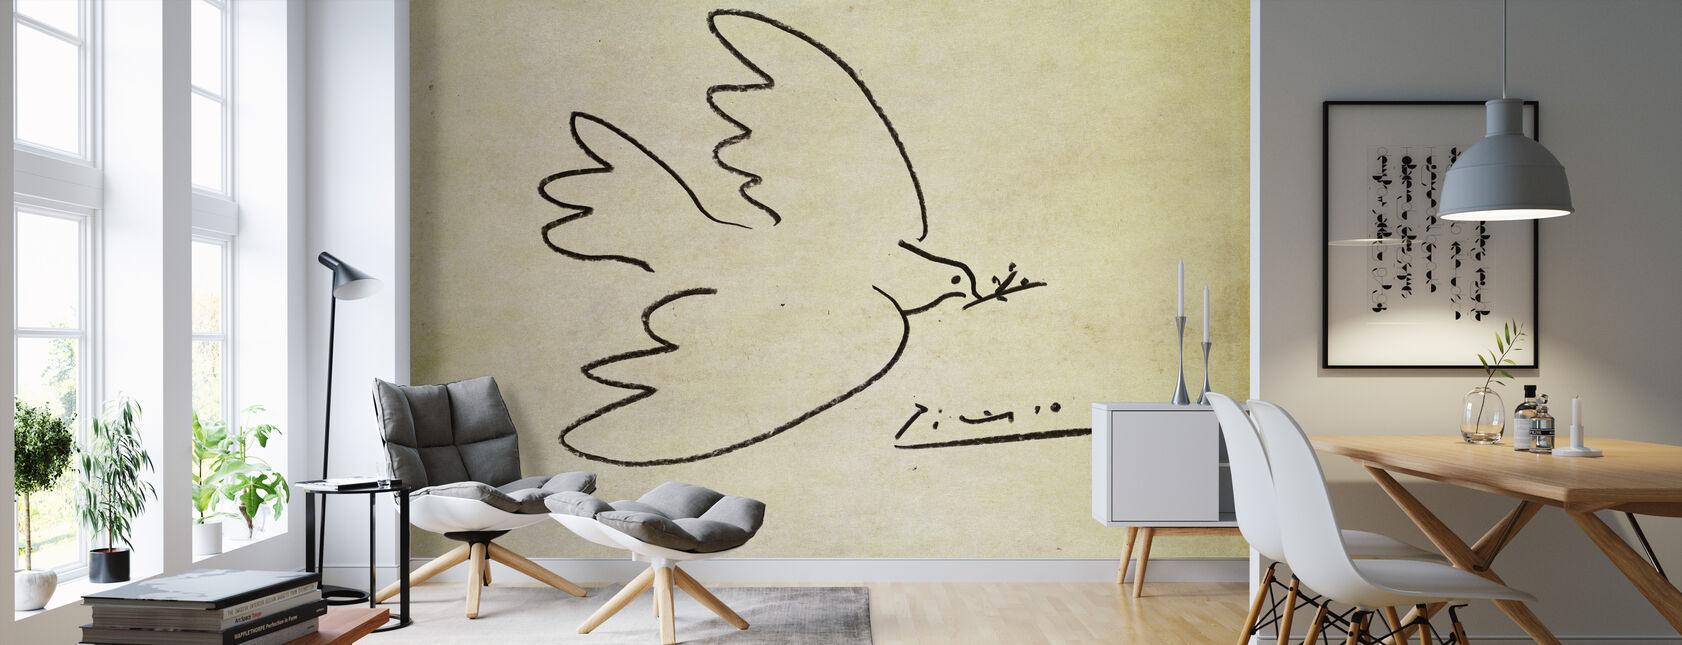 Where - Pablo Picasso - Wallpaper - Living Room